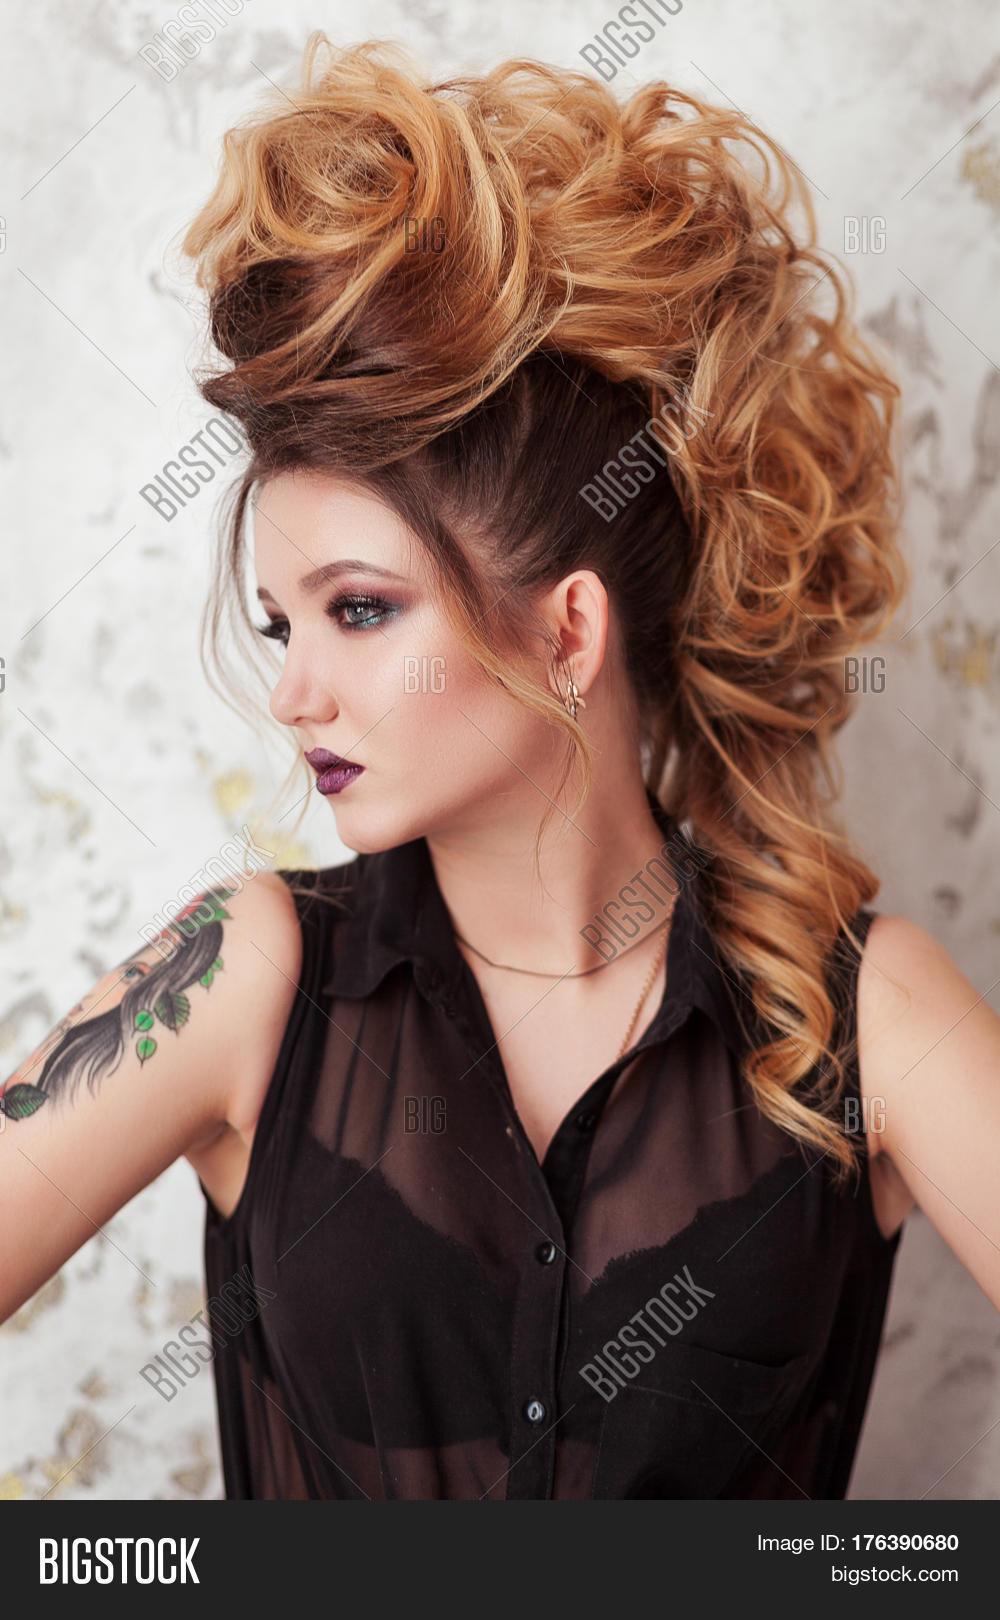 Fashion Shiny Makeup Image Photo Free Trial Bigstock